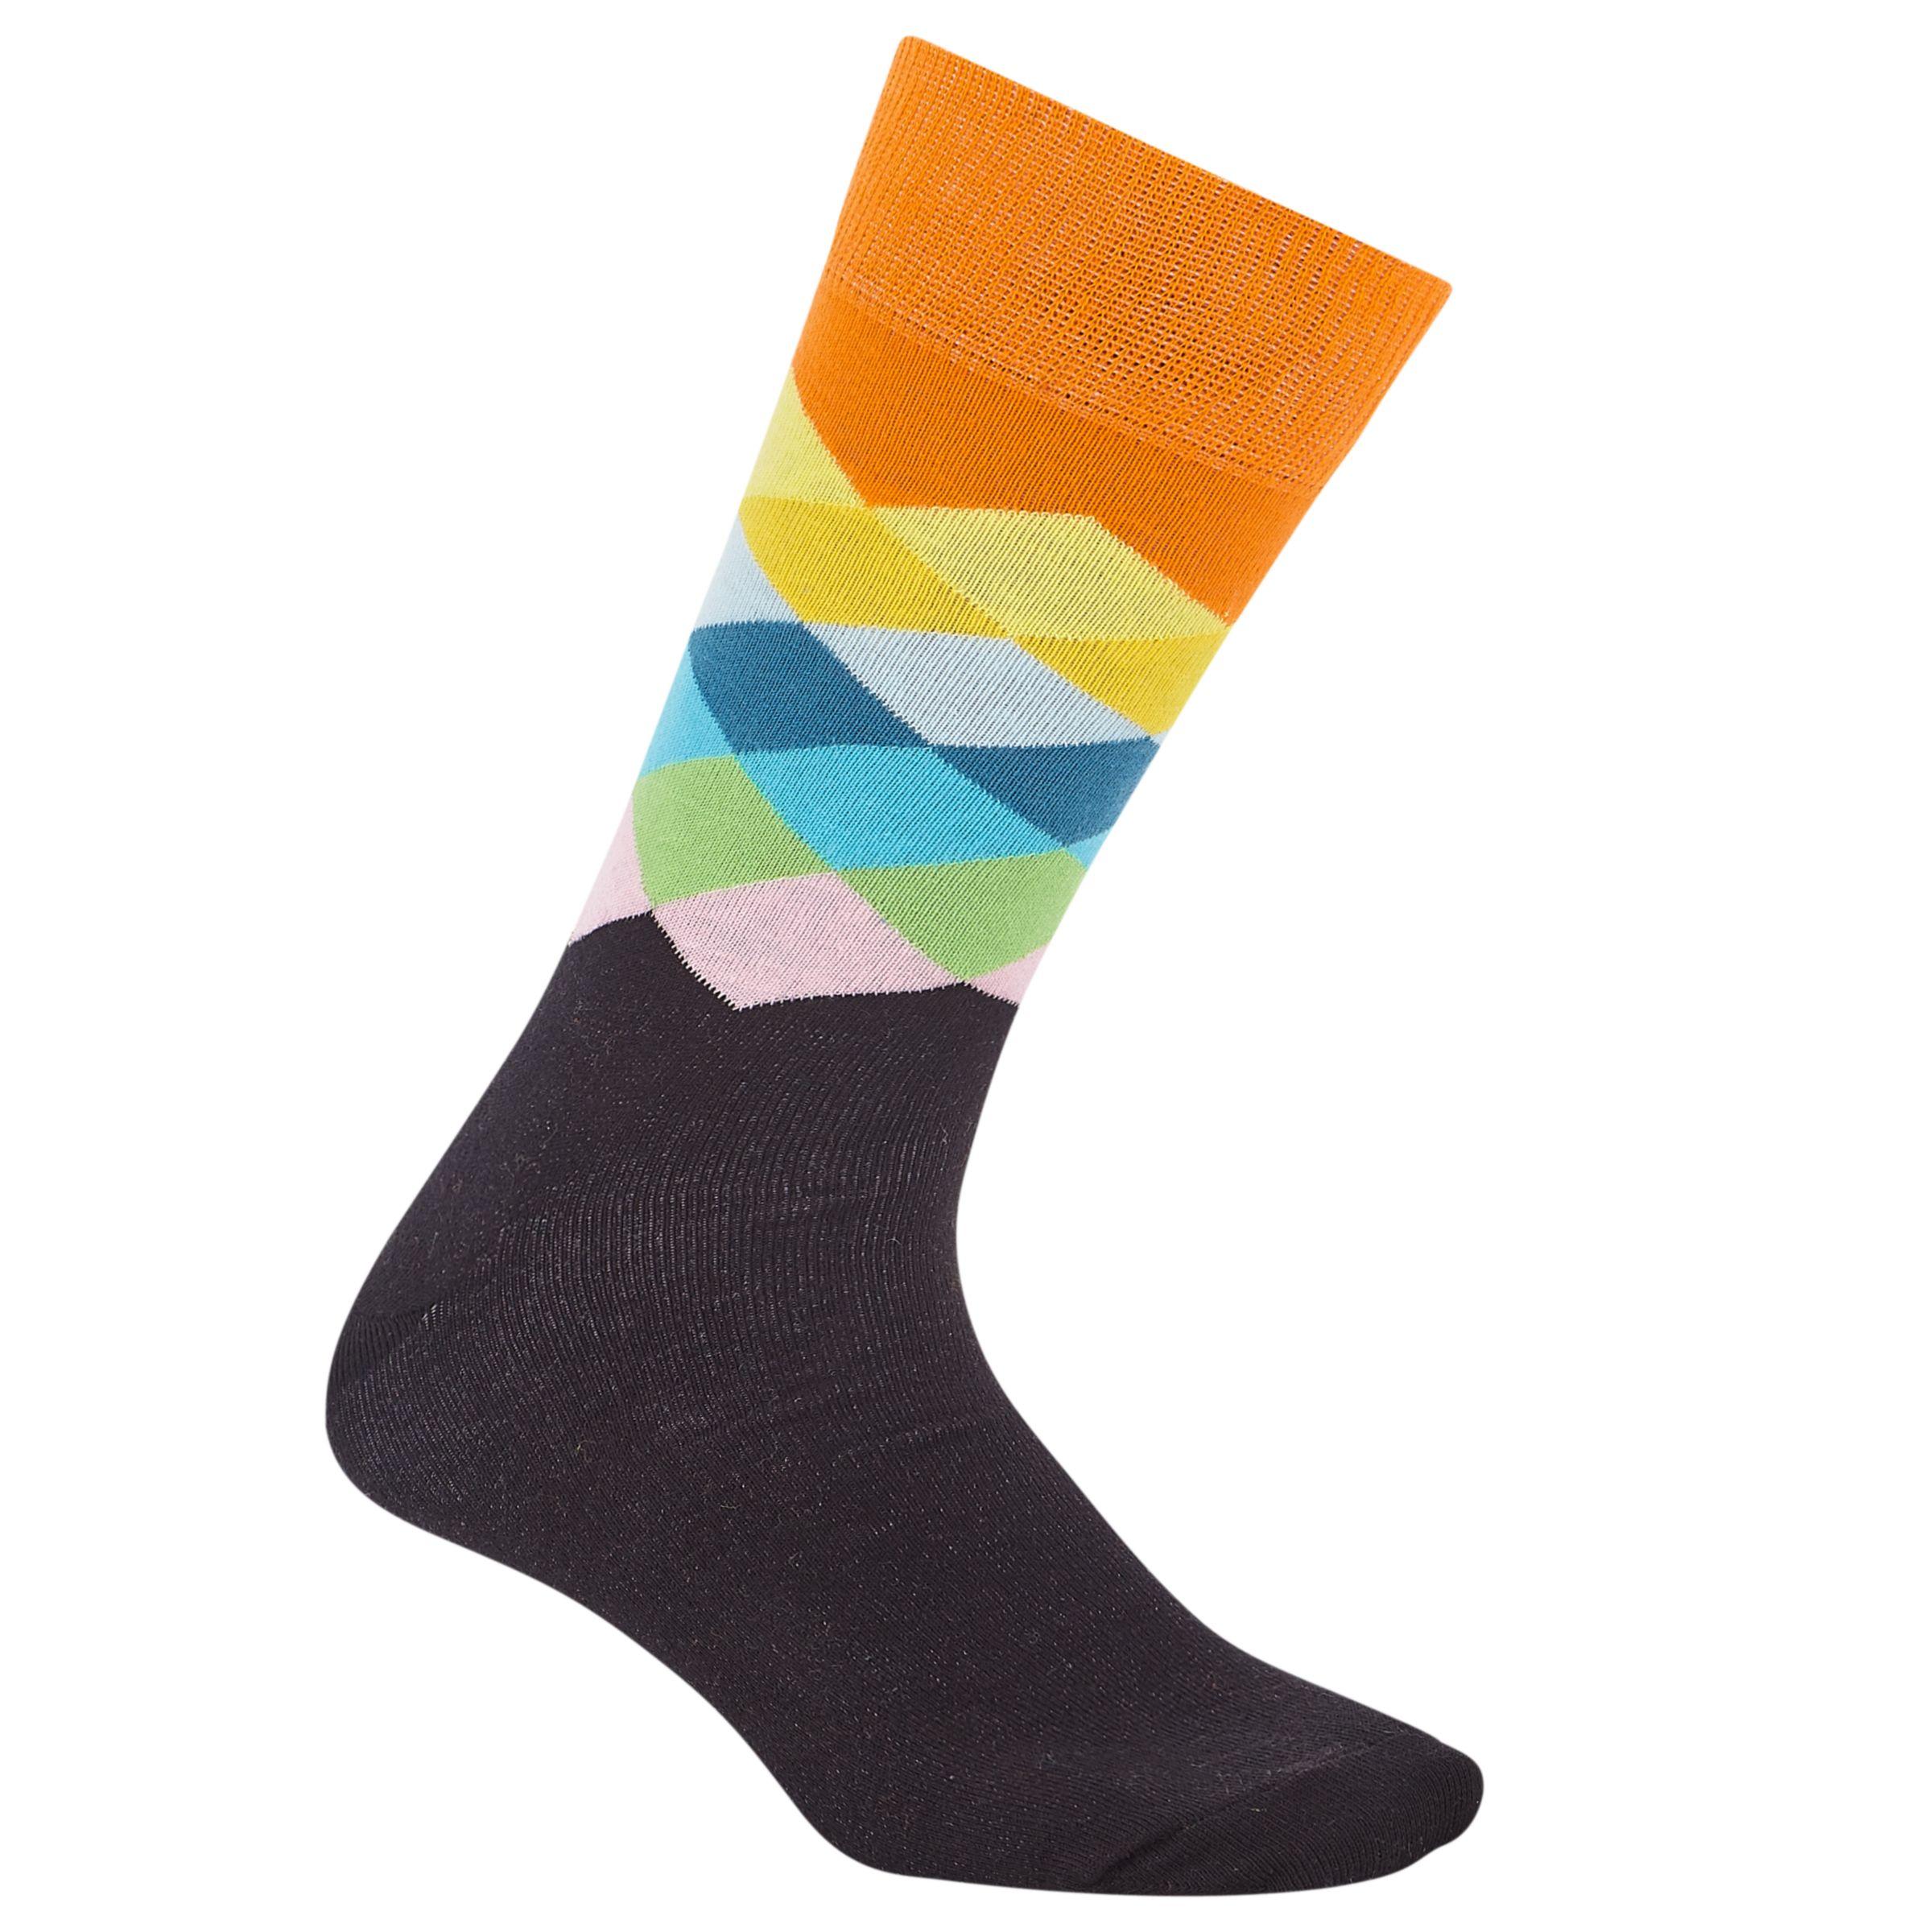 Happy Socks Happy Socks Faded Diamond Socks, One Size